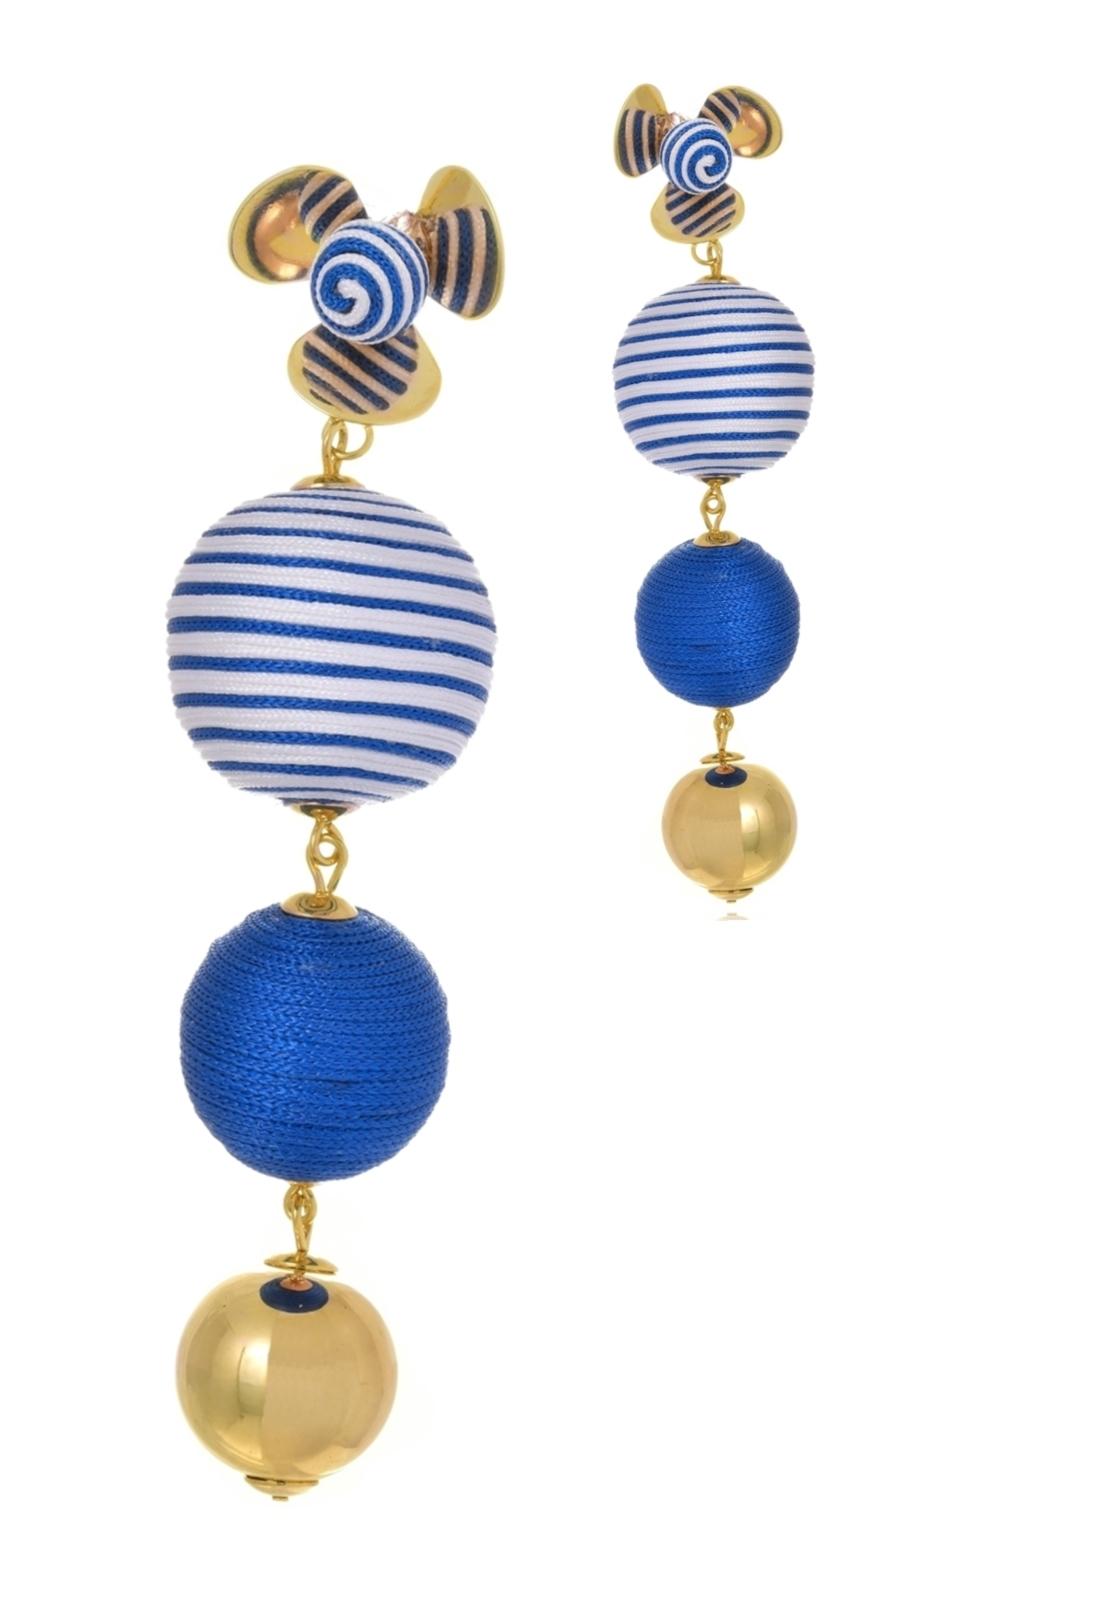 Brinco Le Diamond Flor e Esferas Seda Azul